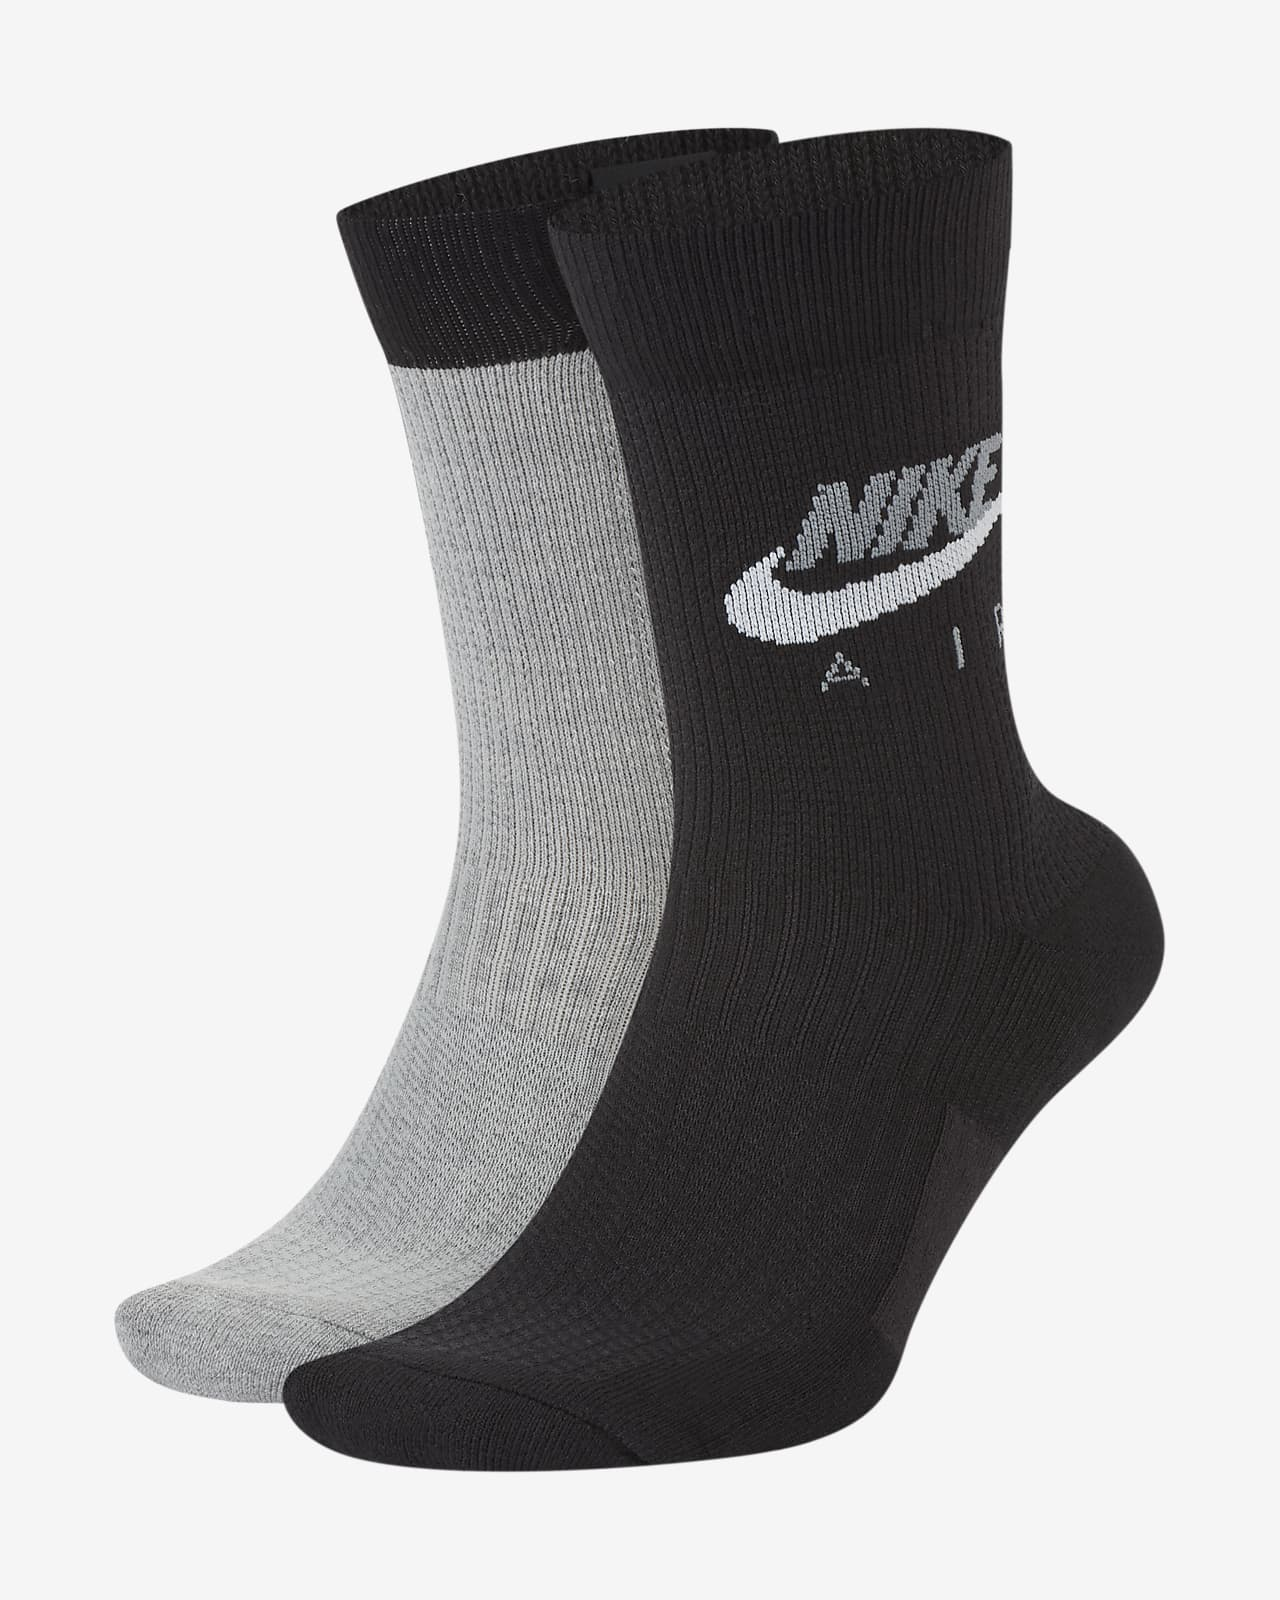 Nike Air SNKR SOX Crew Socks (2 Pairs